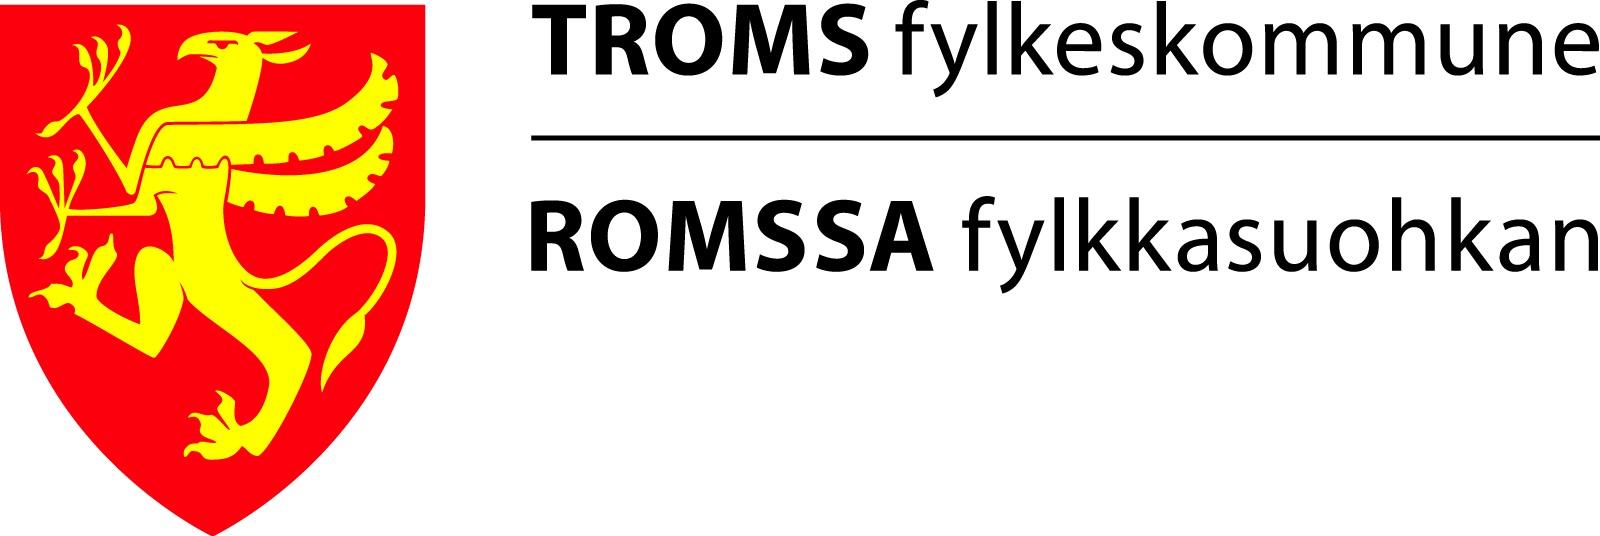 Troms fylkeskommune